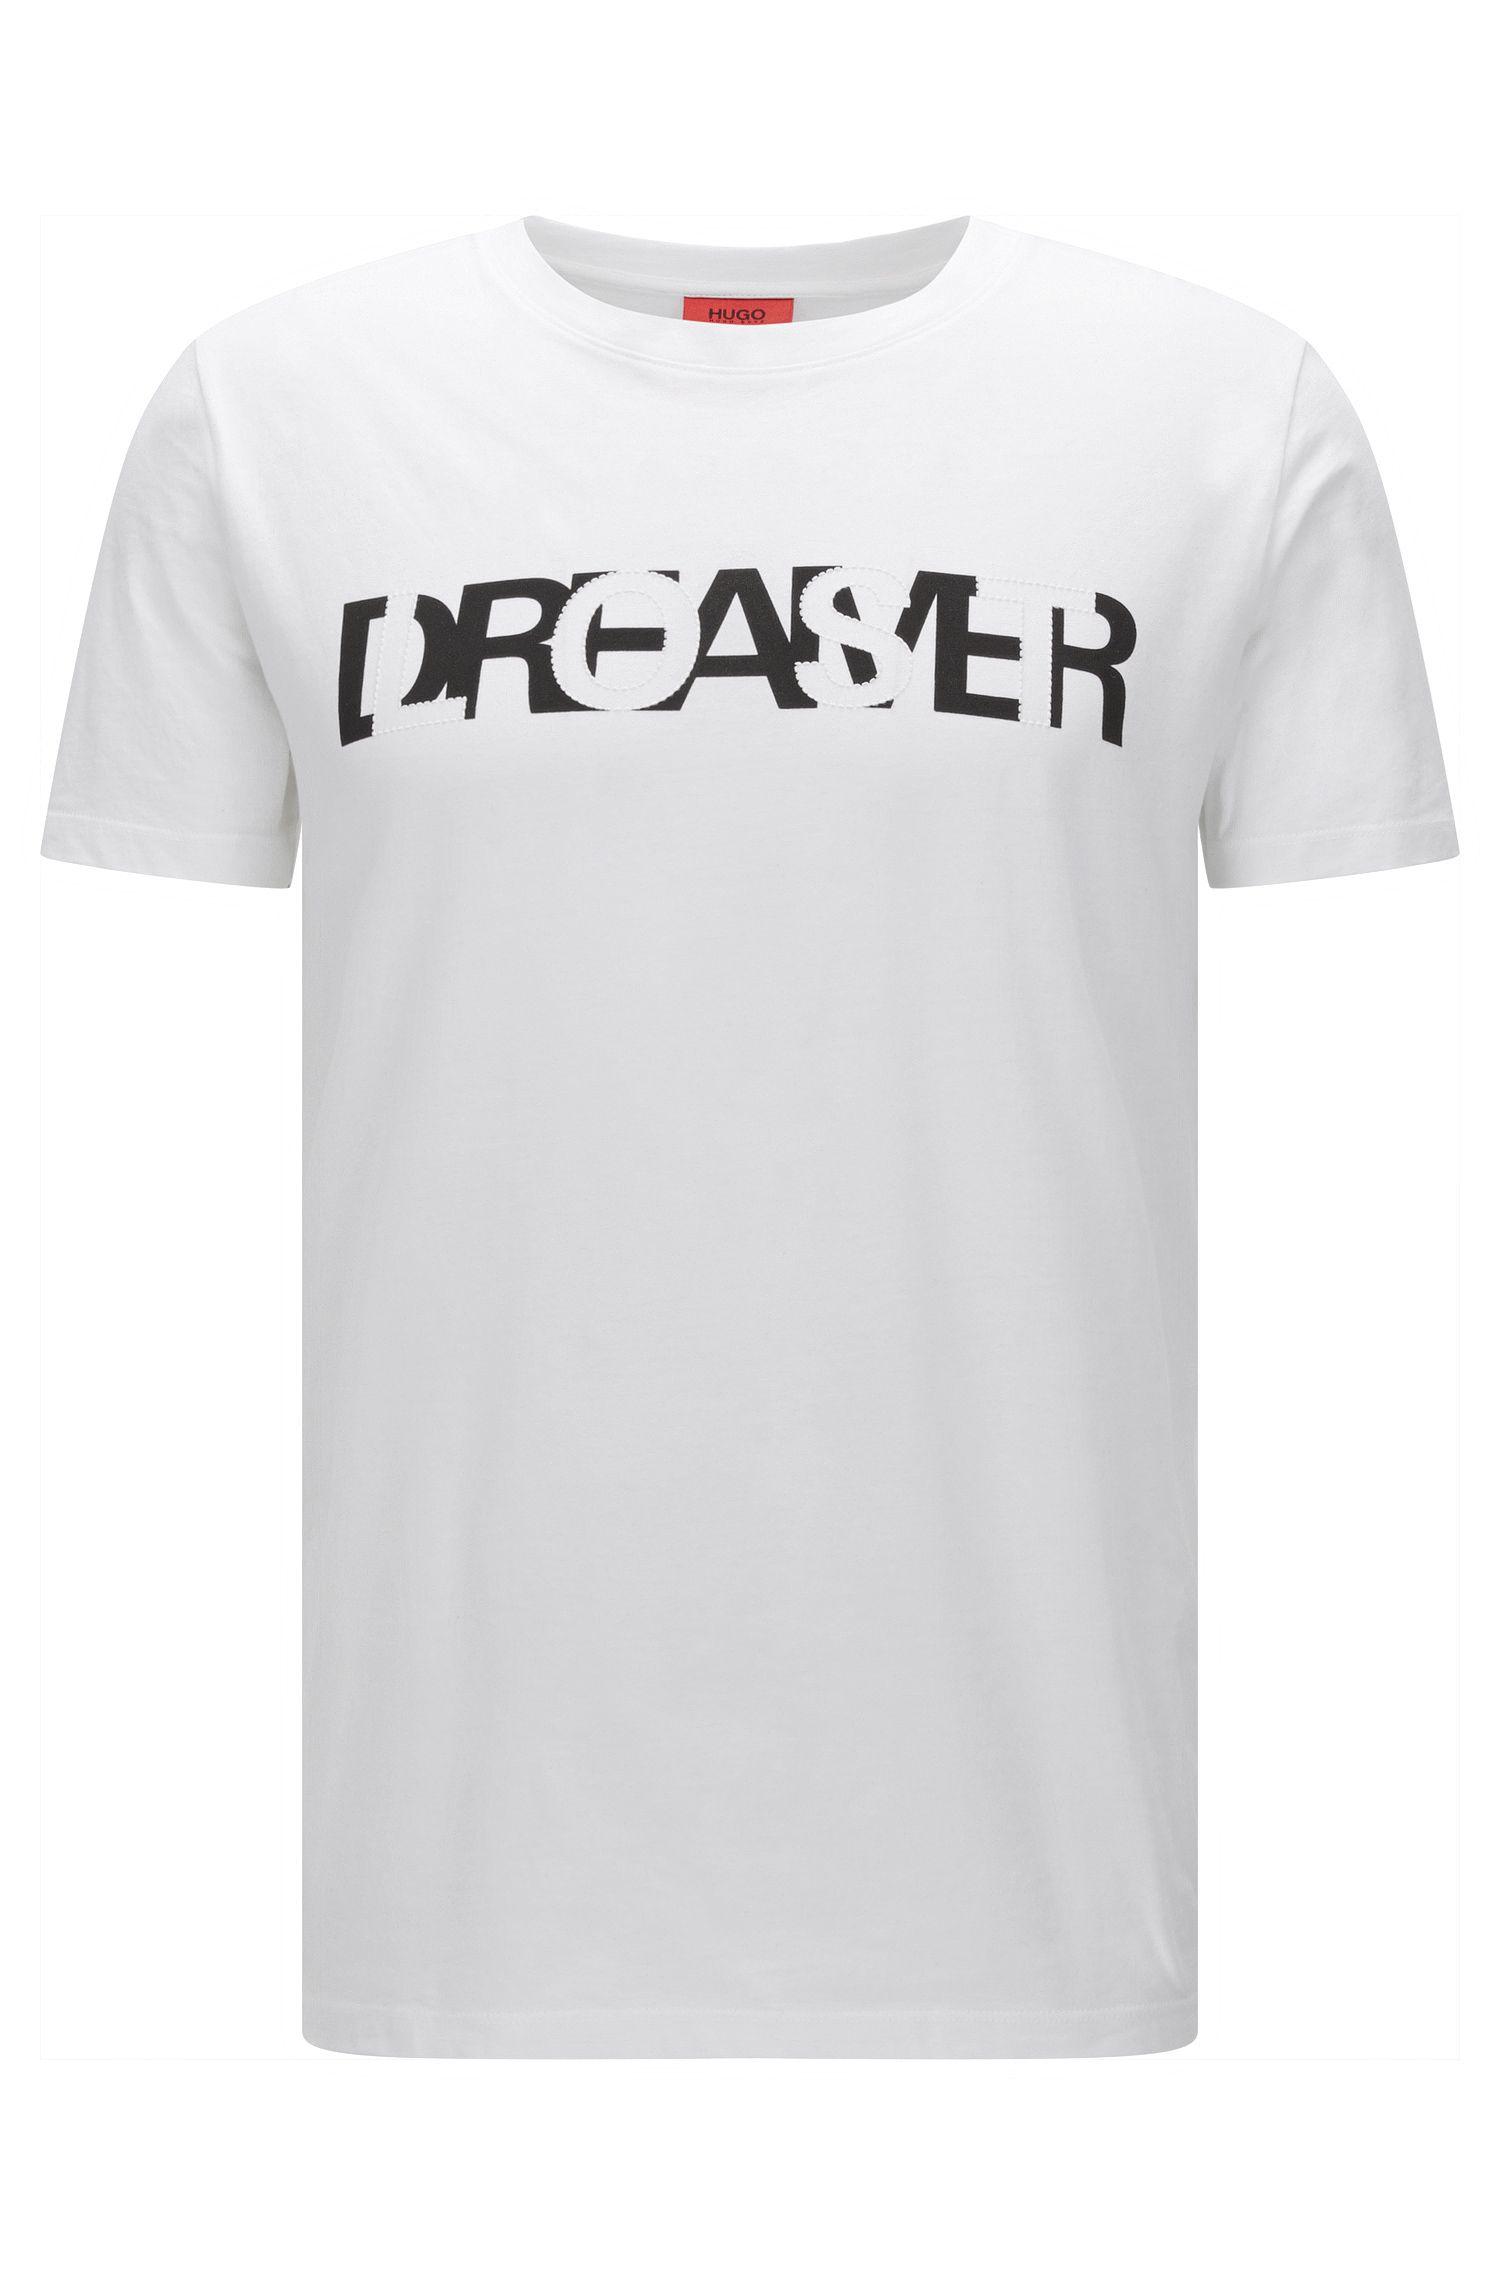 Cotton Graphic T-Shirt   Dreamer